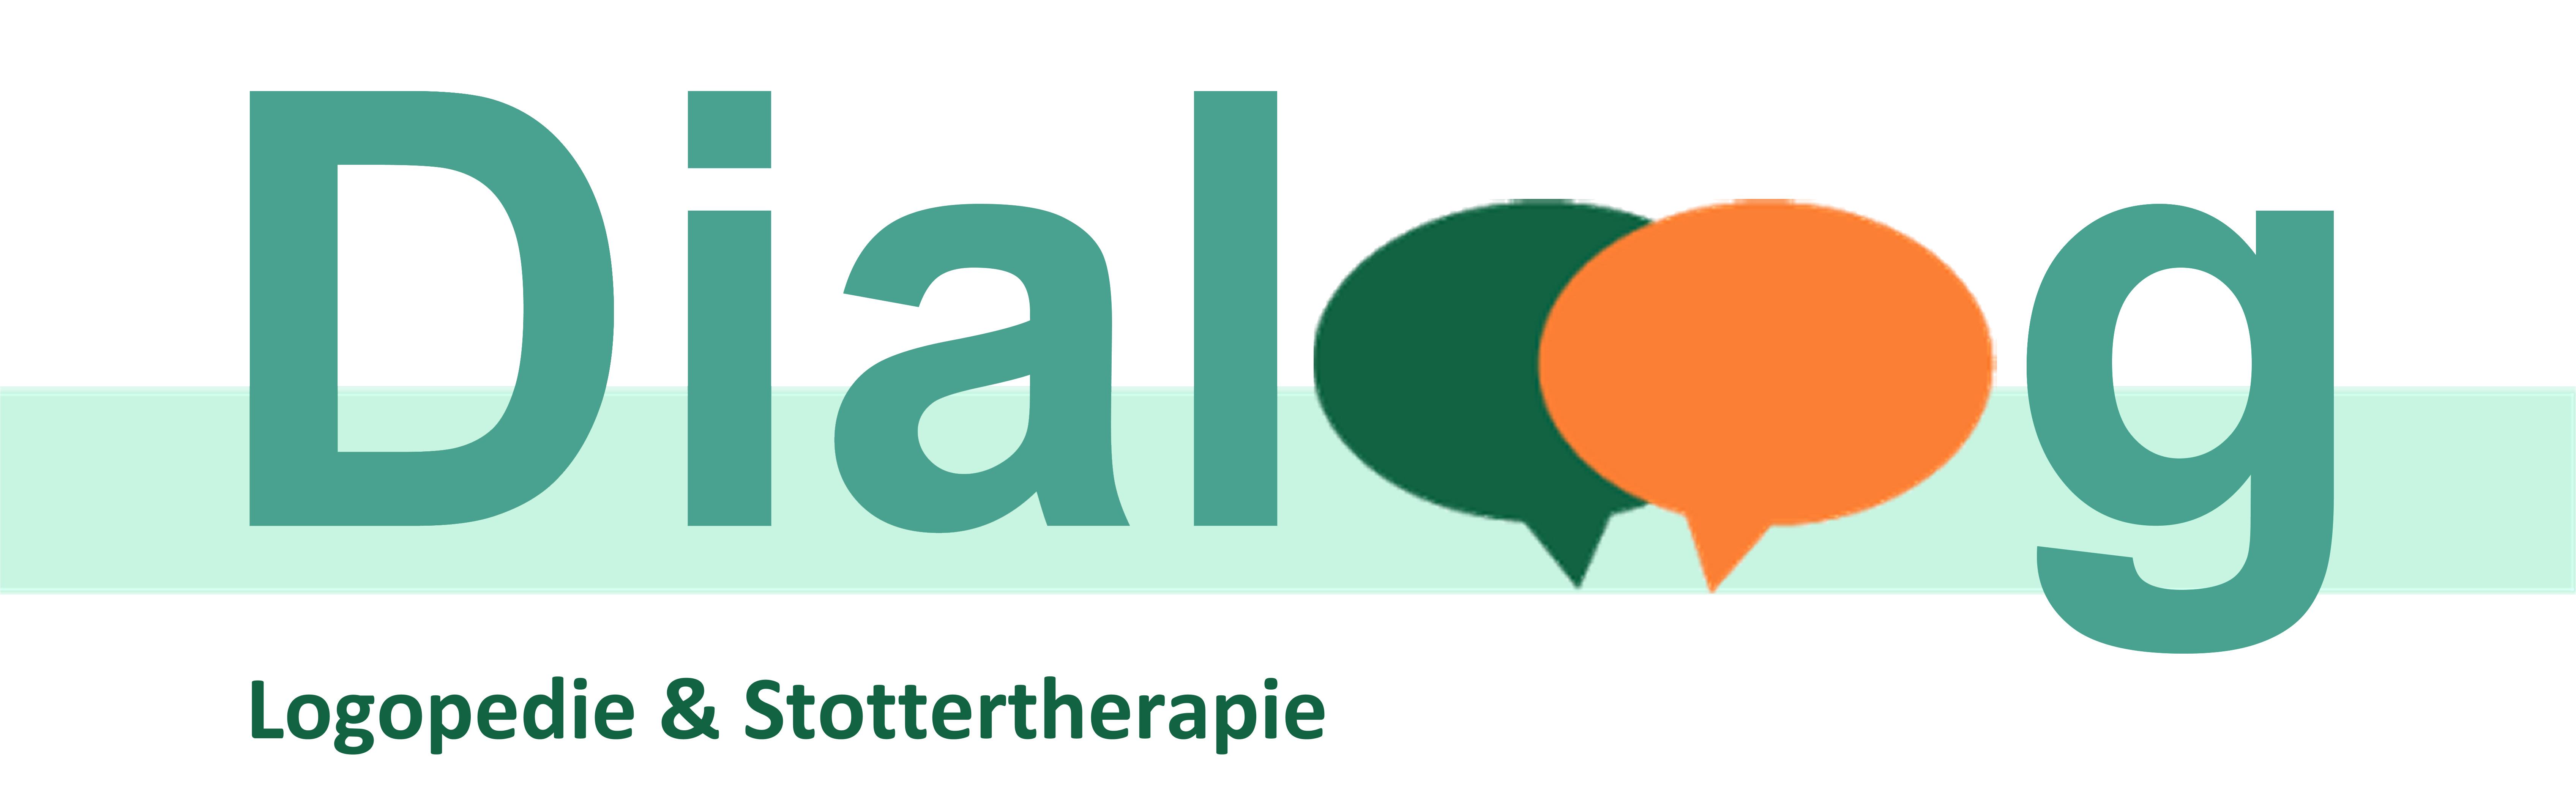 Logopediepraktijk Dialoog